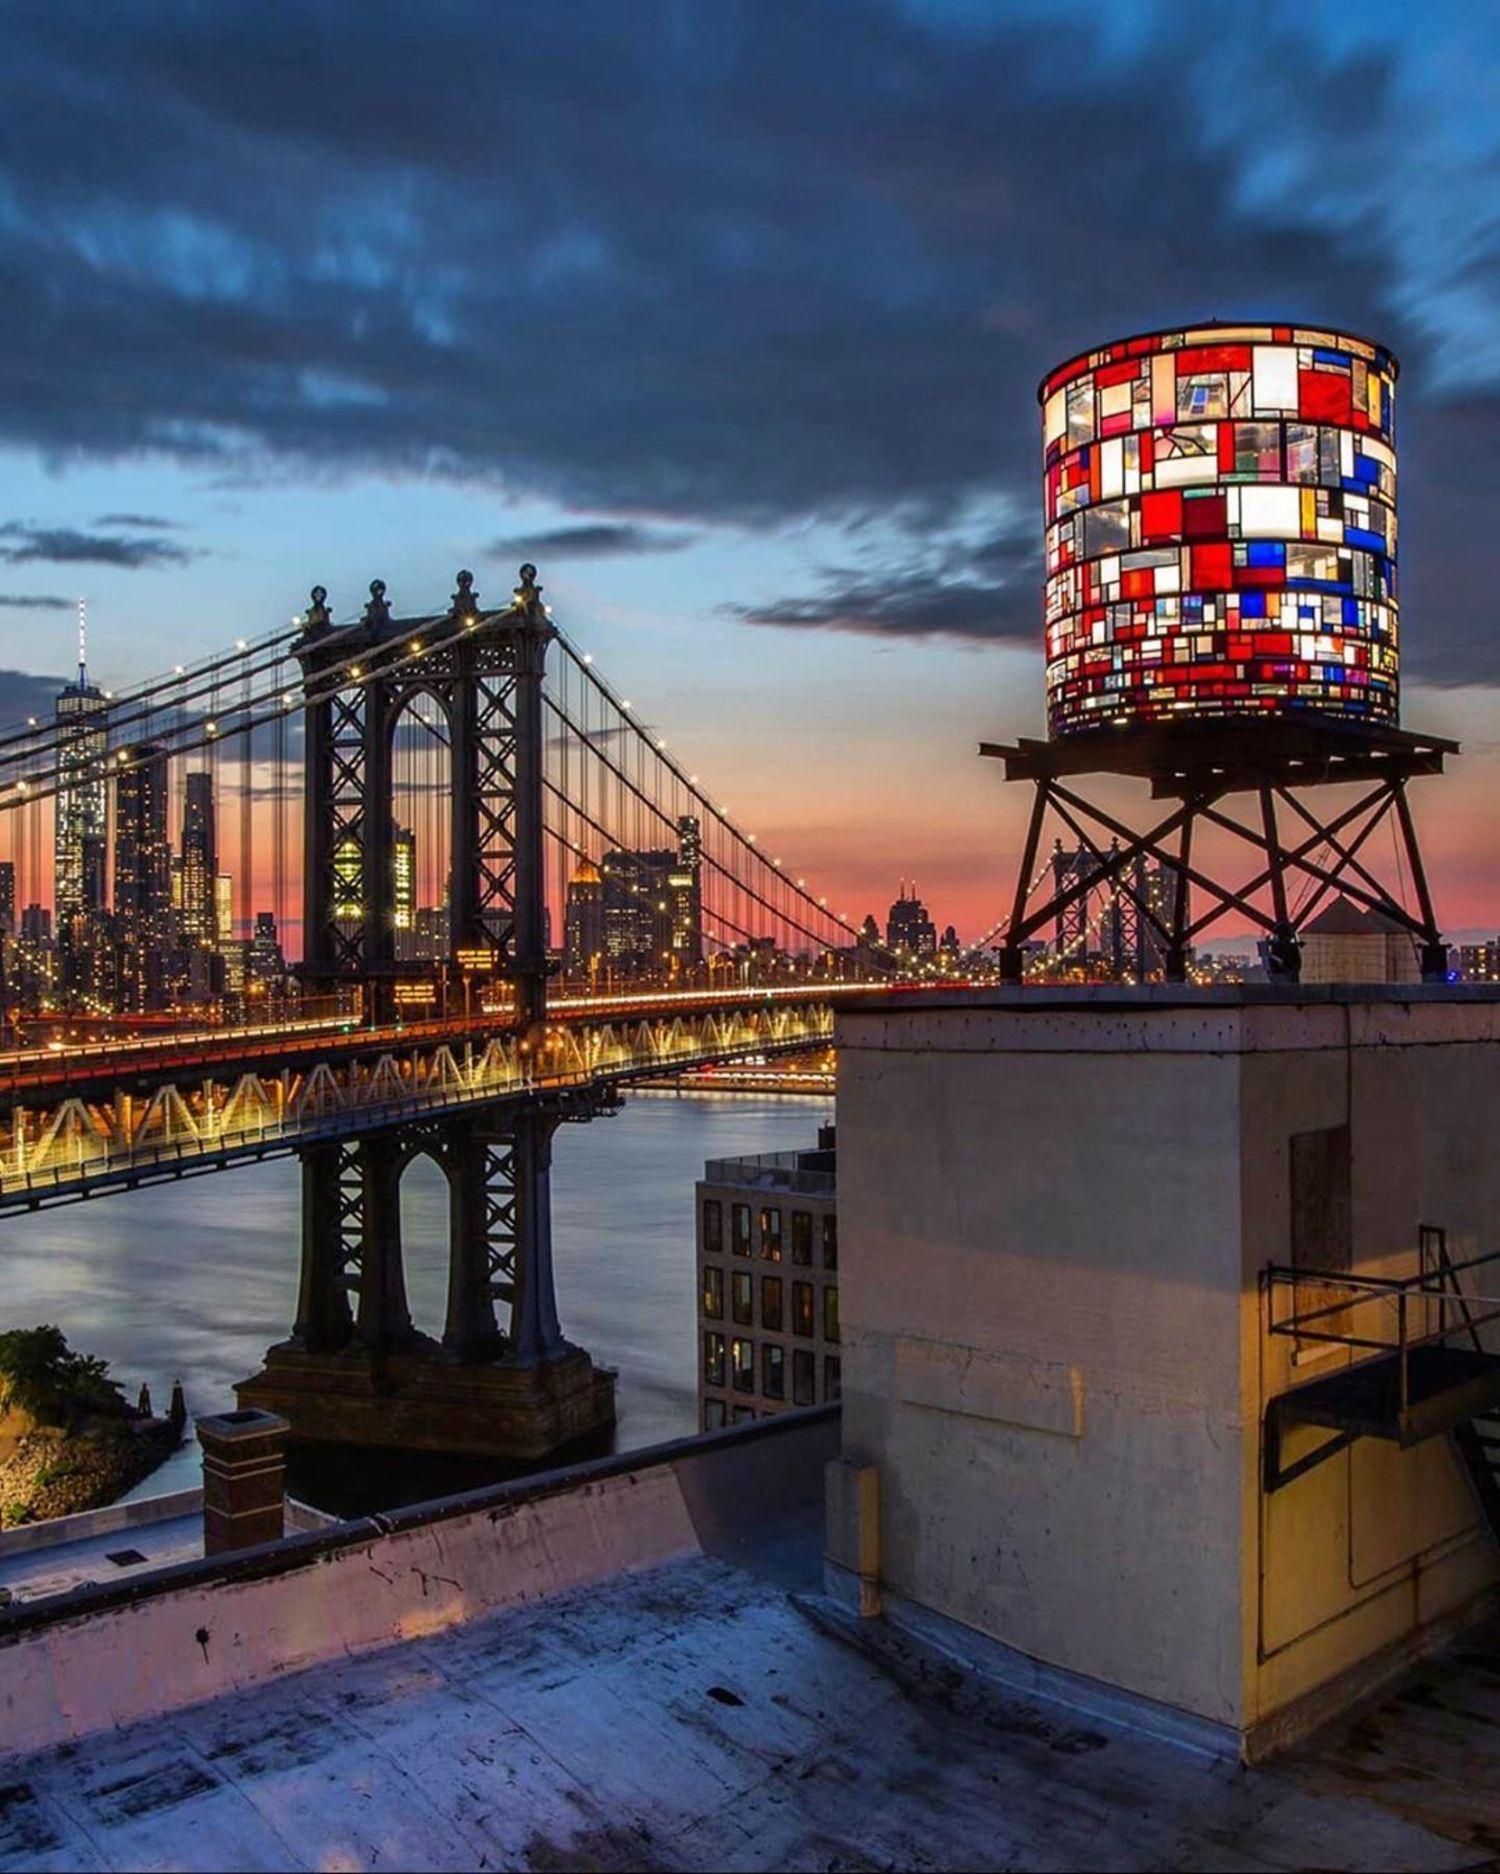 Watertown, Tom Fruin, DUMBO, Brooklyn